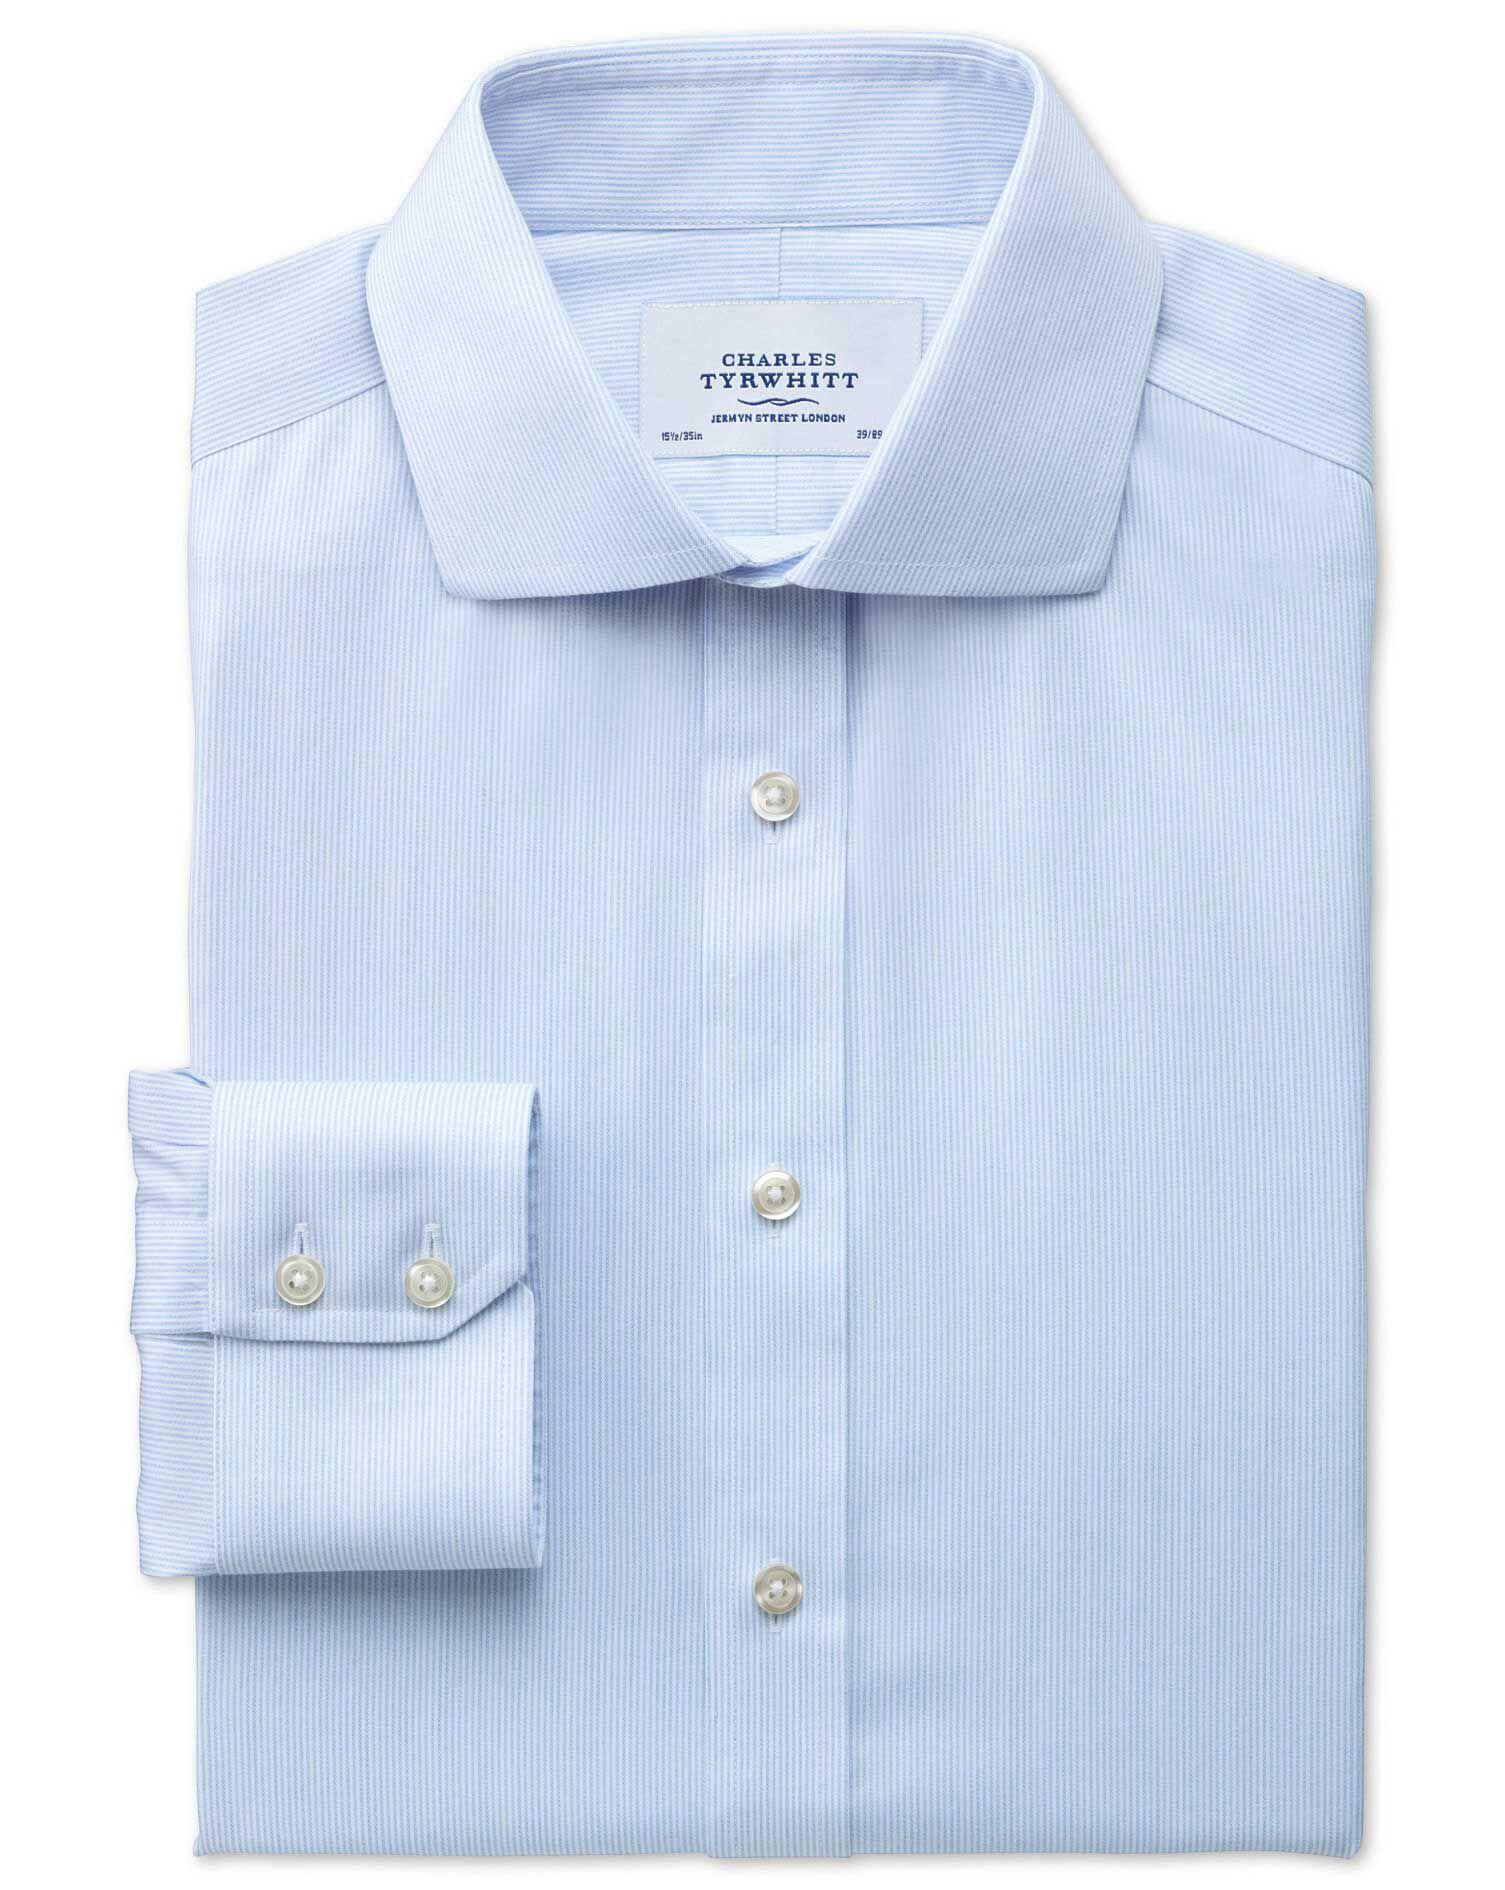 Slim Fit Cutaway Collar Non-Iron Mouline Stripe Sky Blue Cotton Formal Shirt Single Cuff Size 18/35